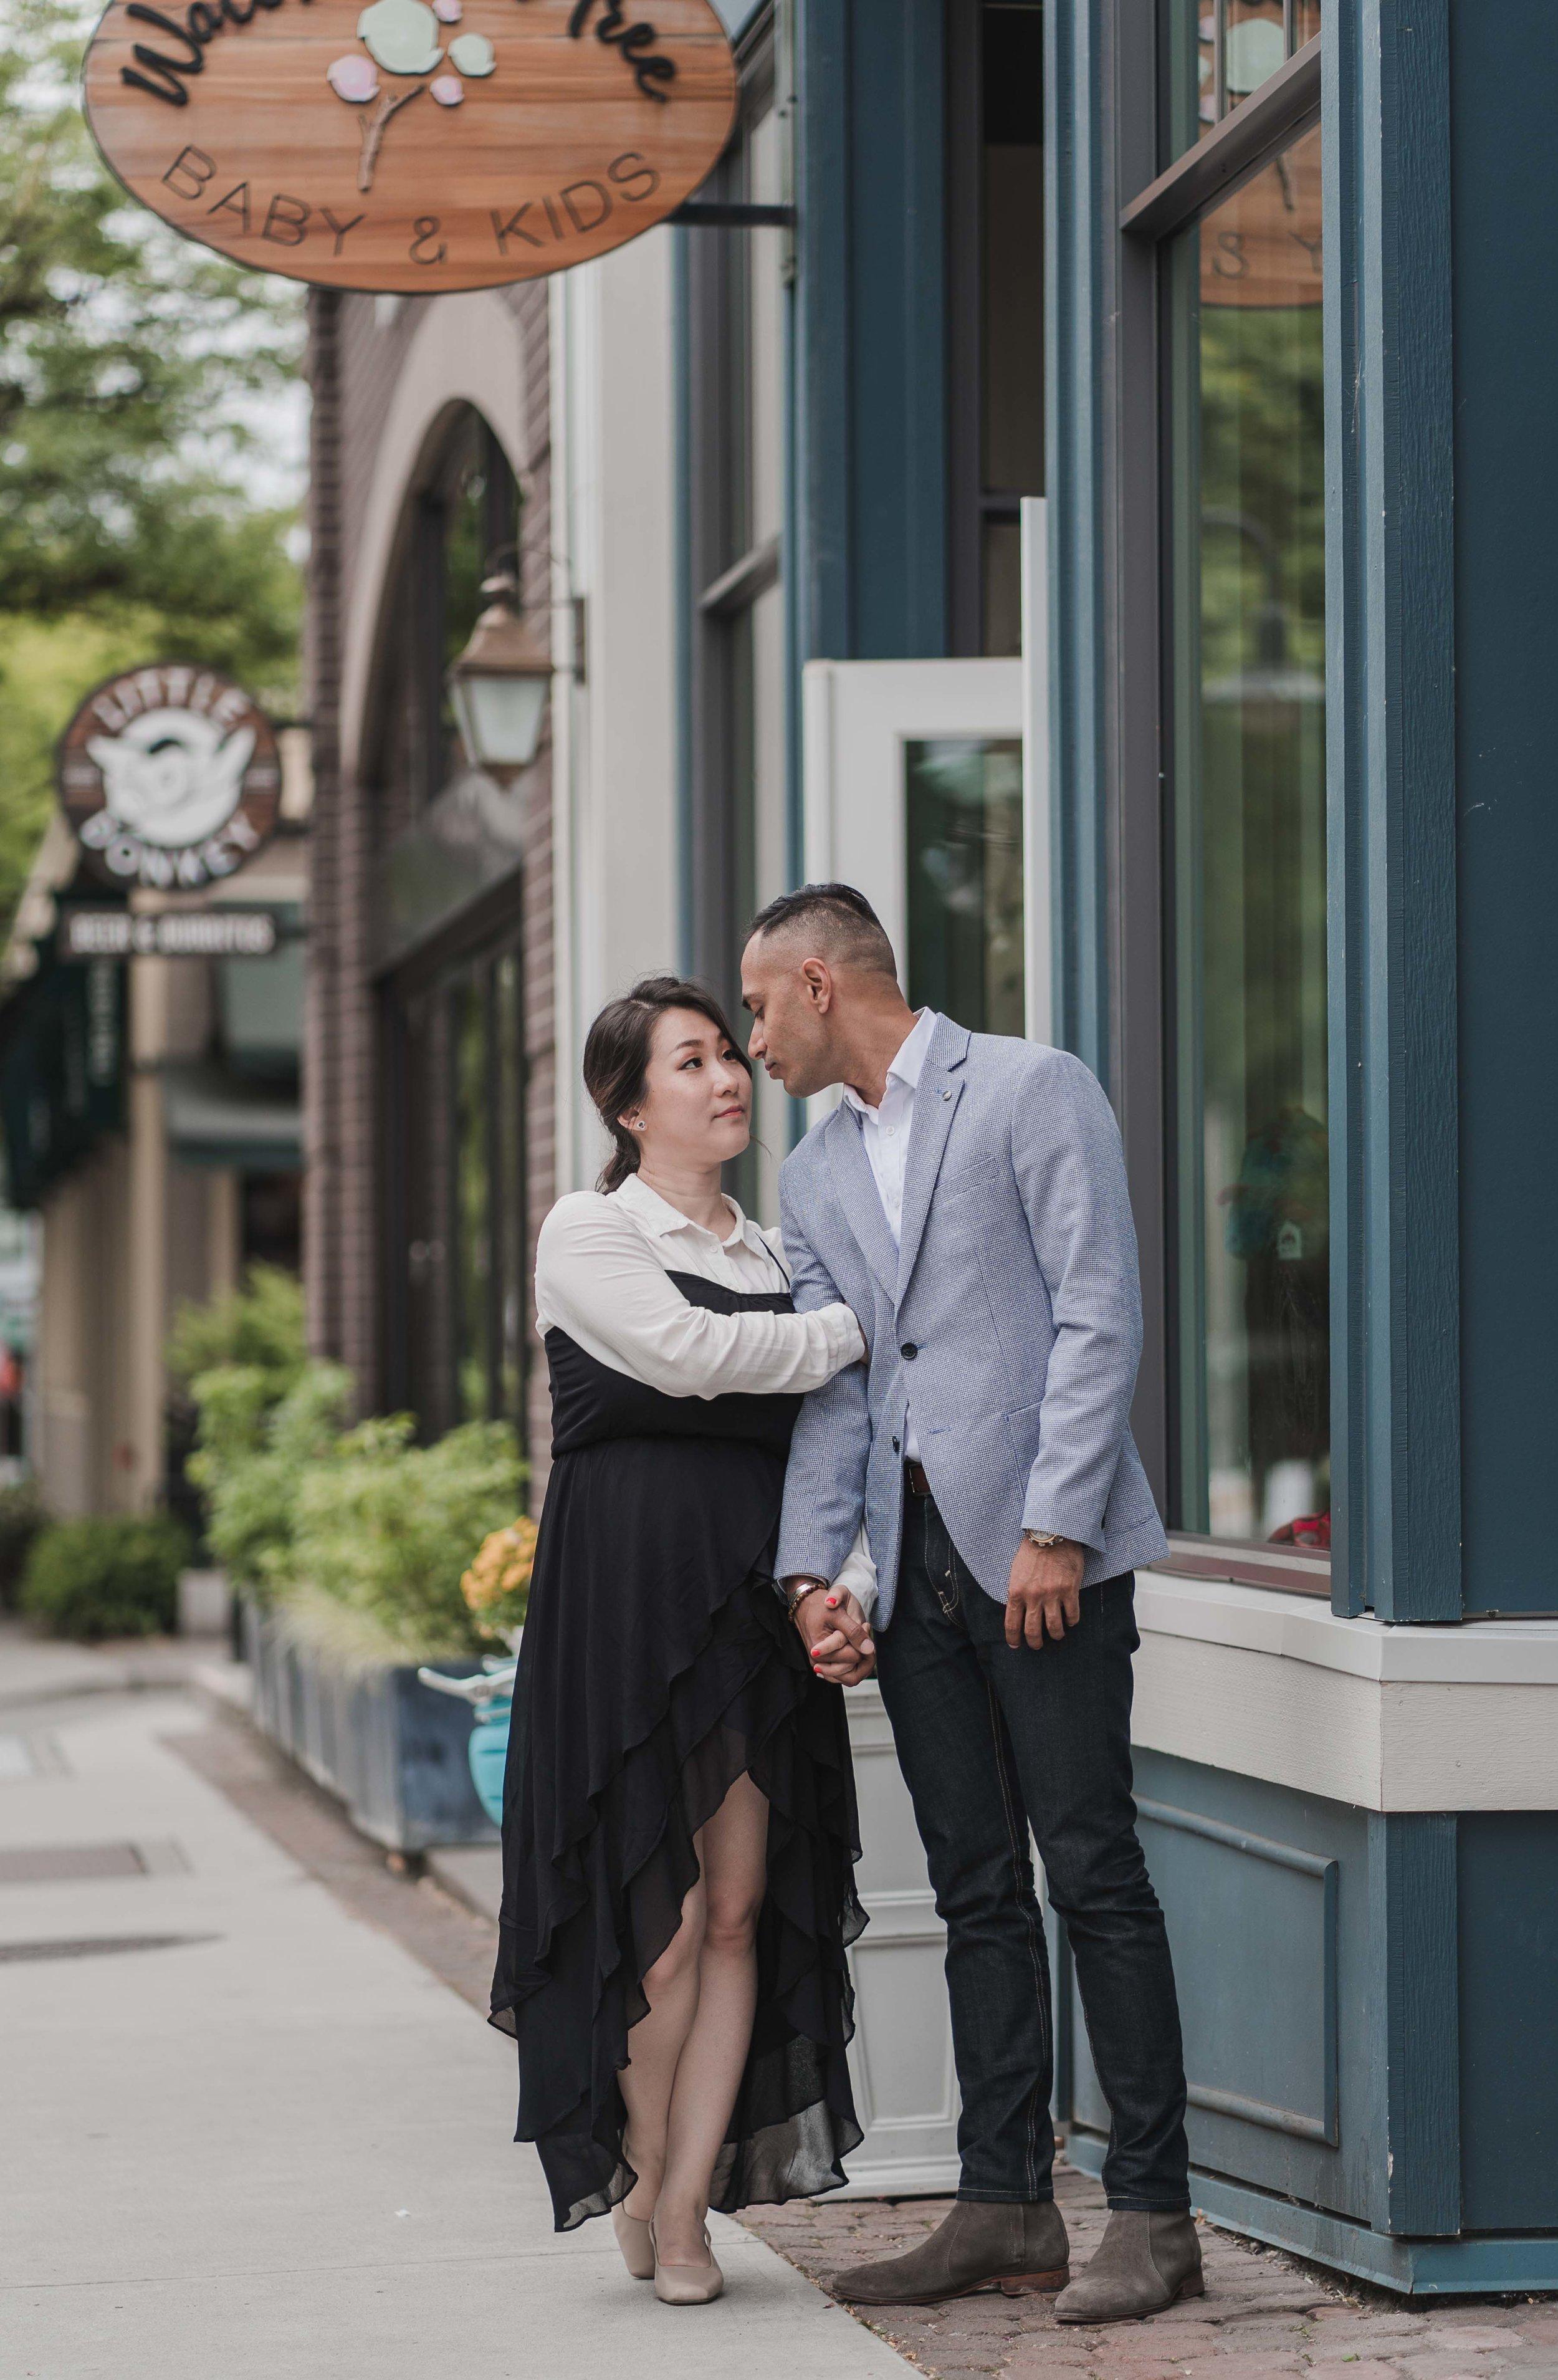 20190622 - Monika & Johnson Engagement - 0213.jpg